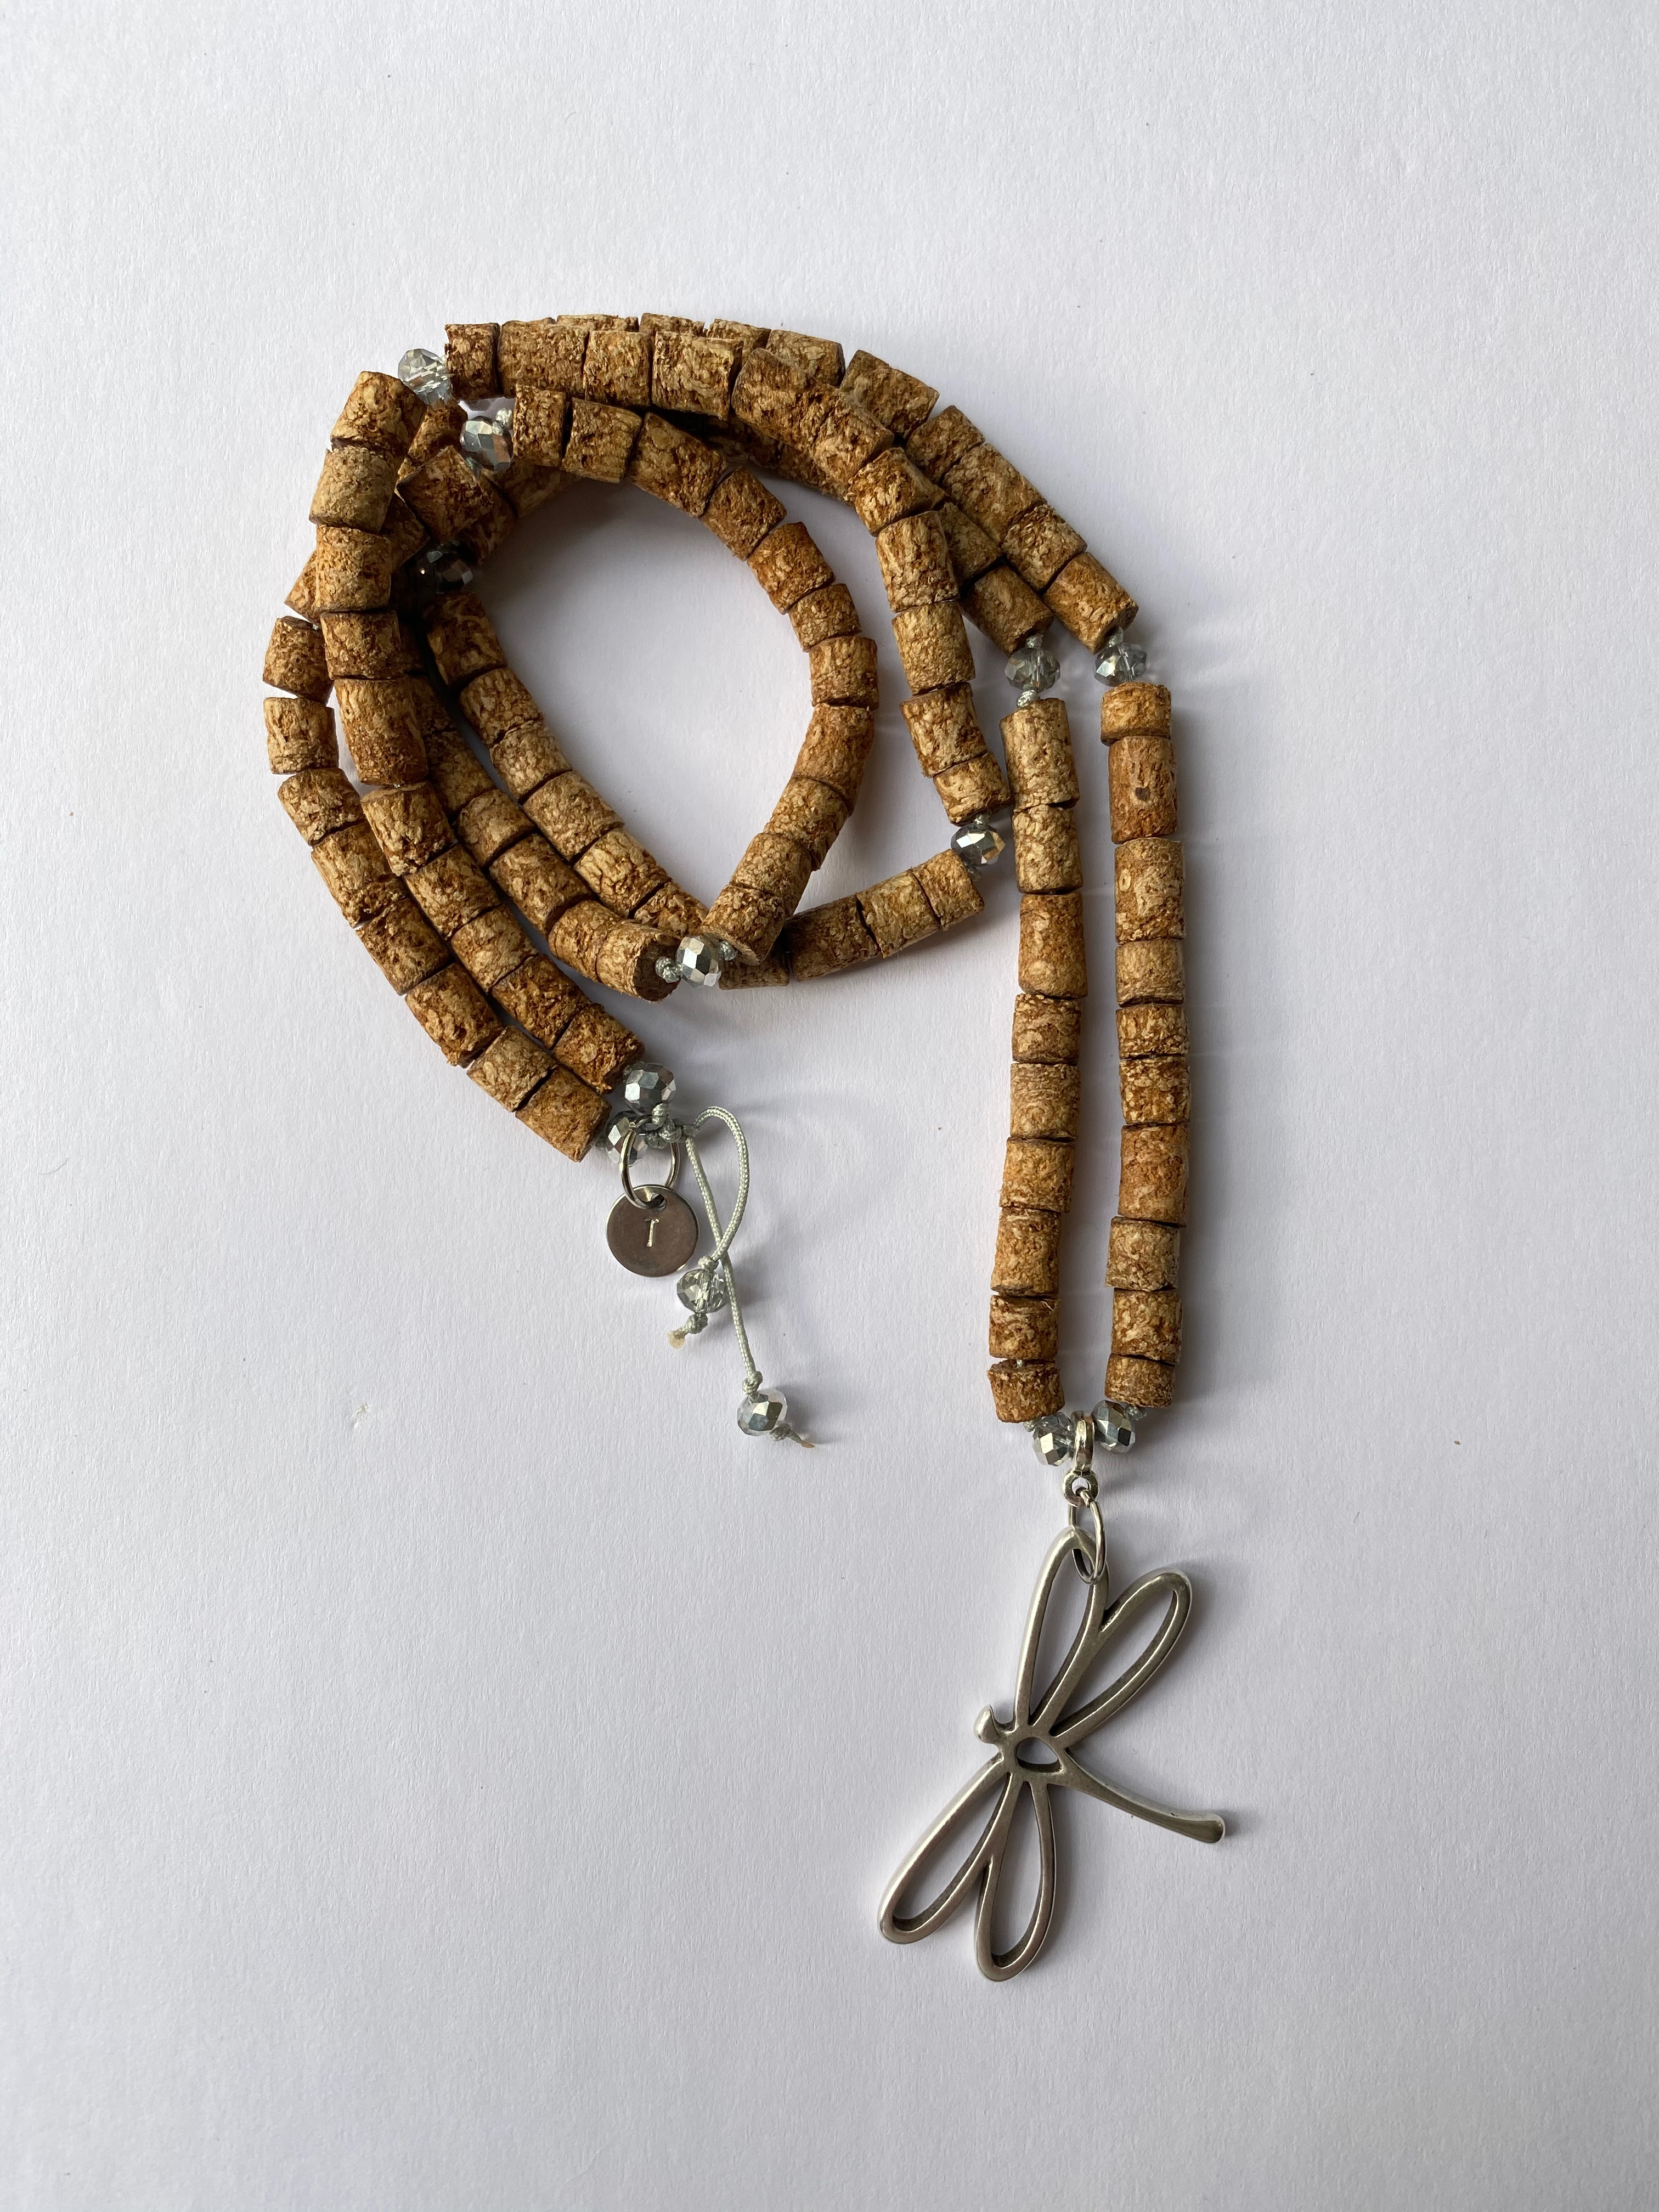 19- STEEL DRAGONFLY cork